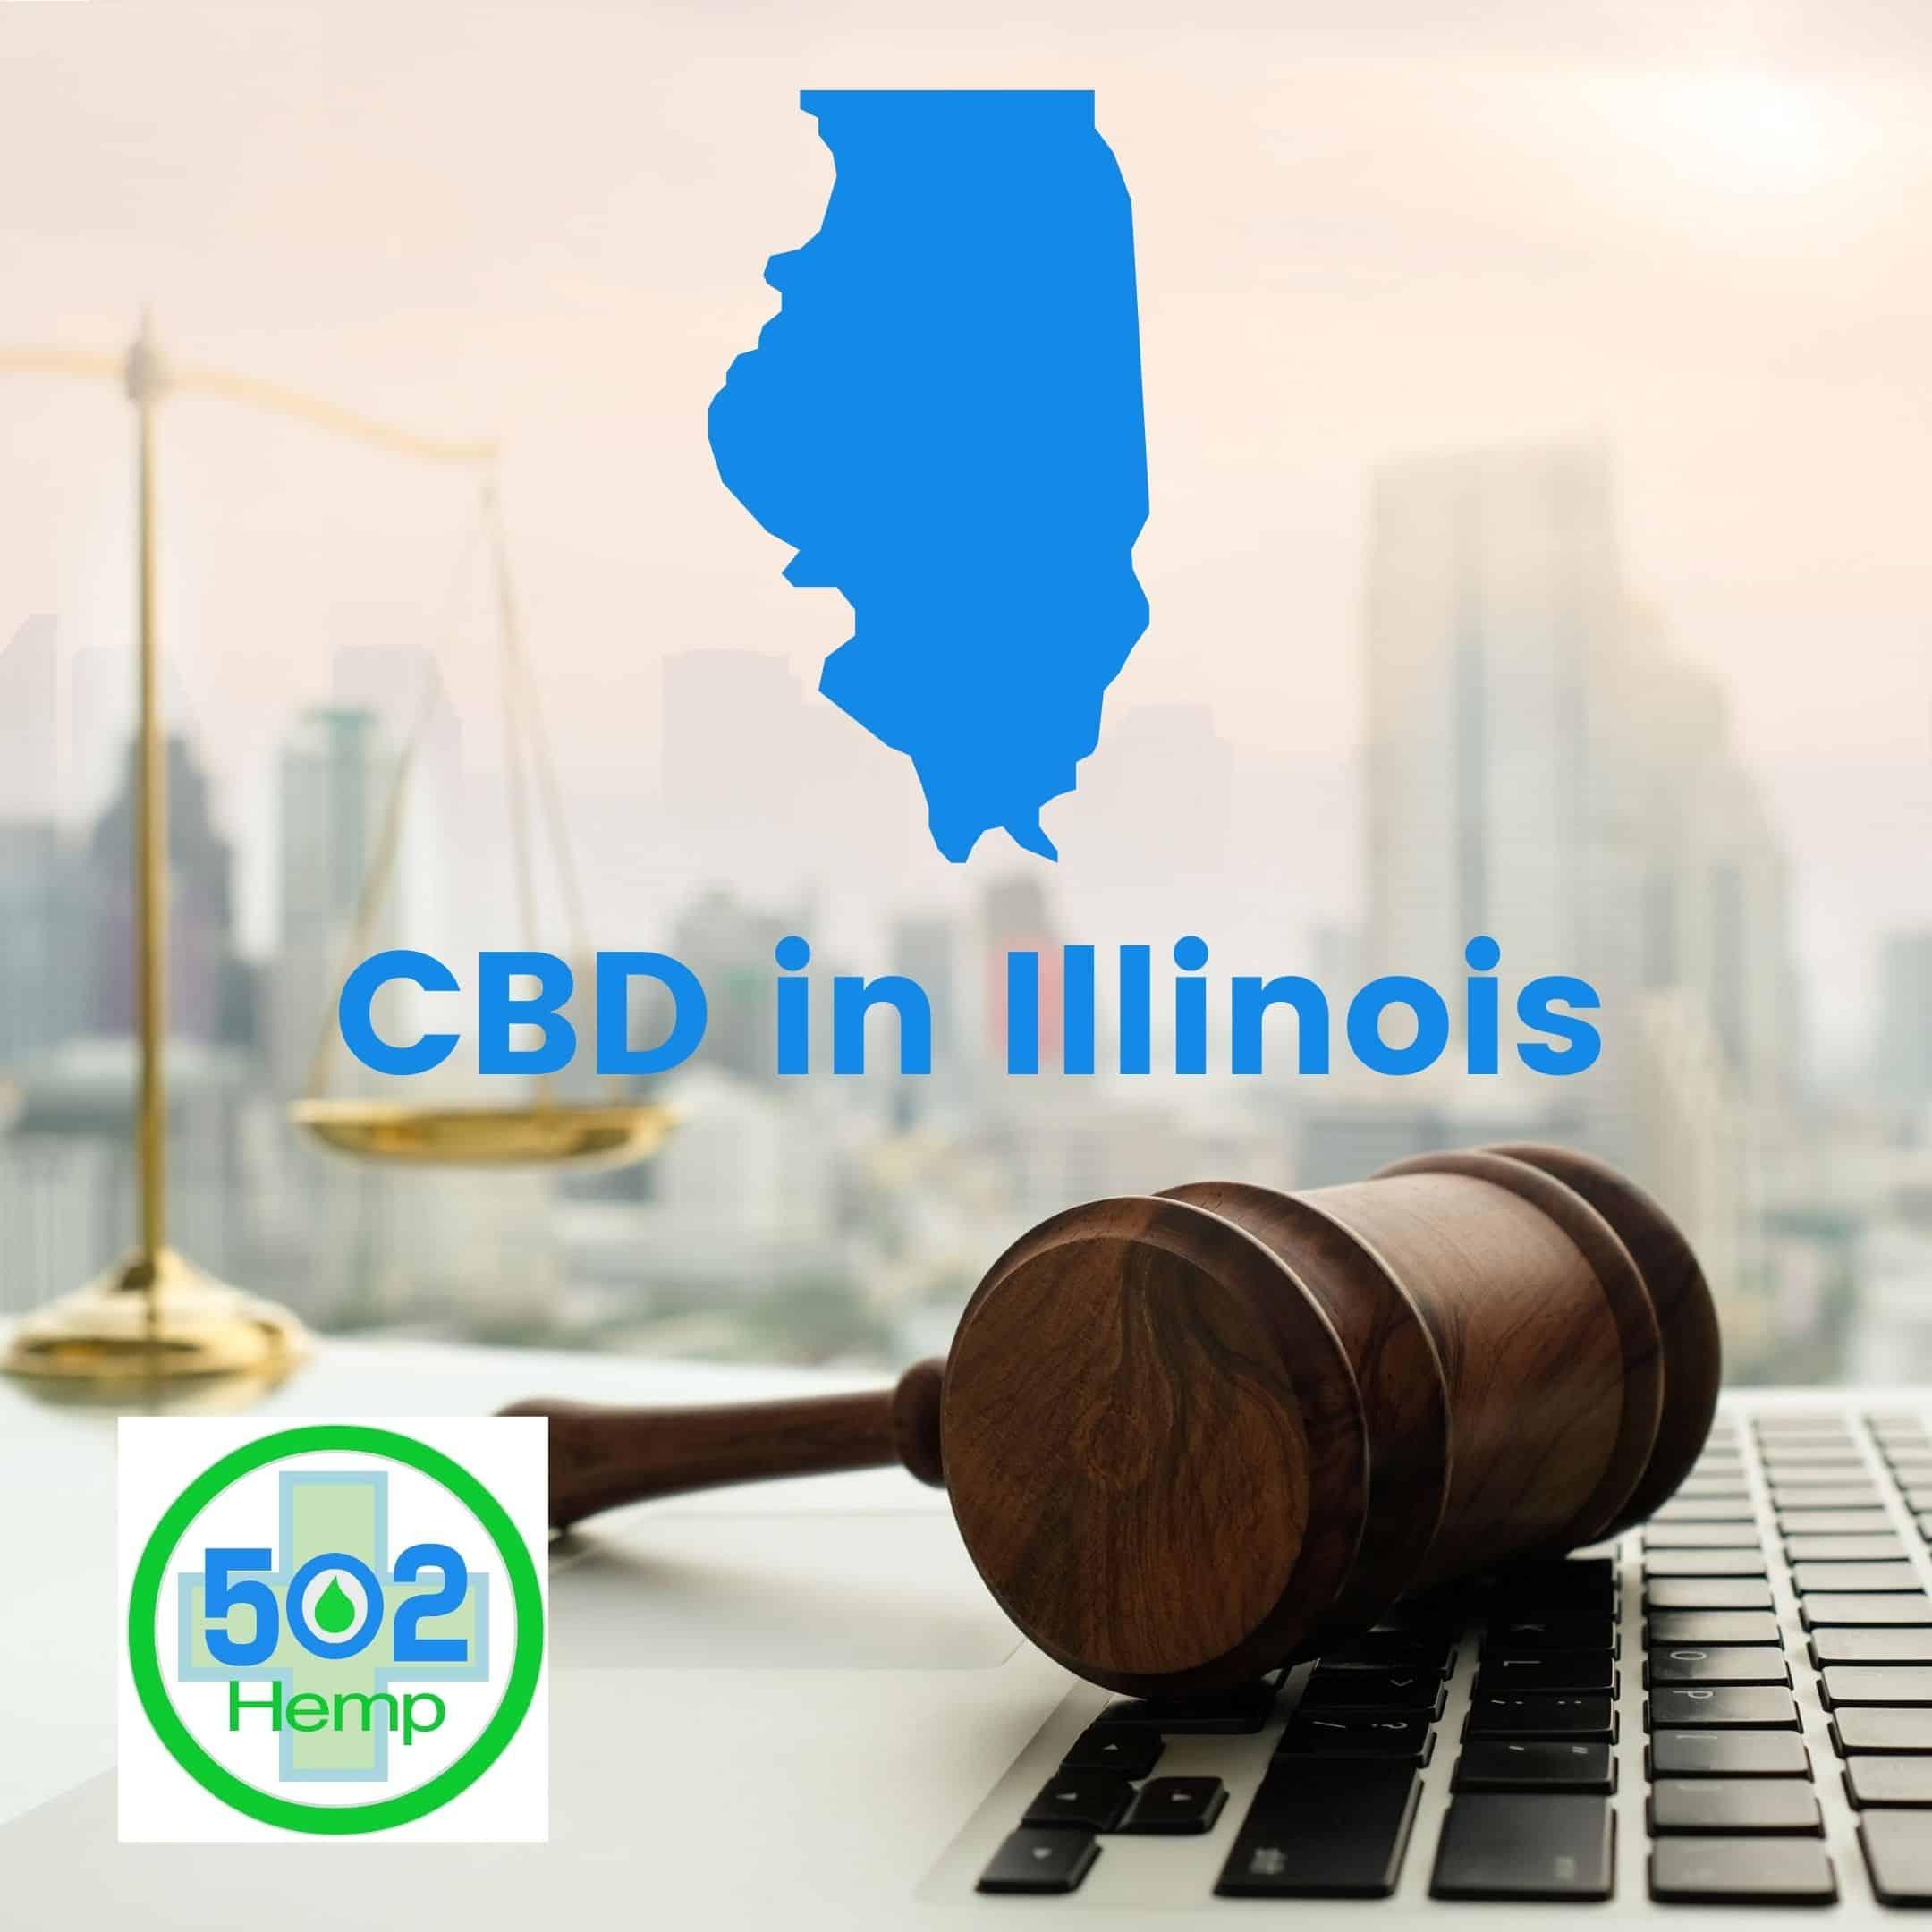 is CBD legal in Illinois